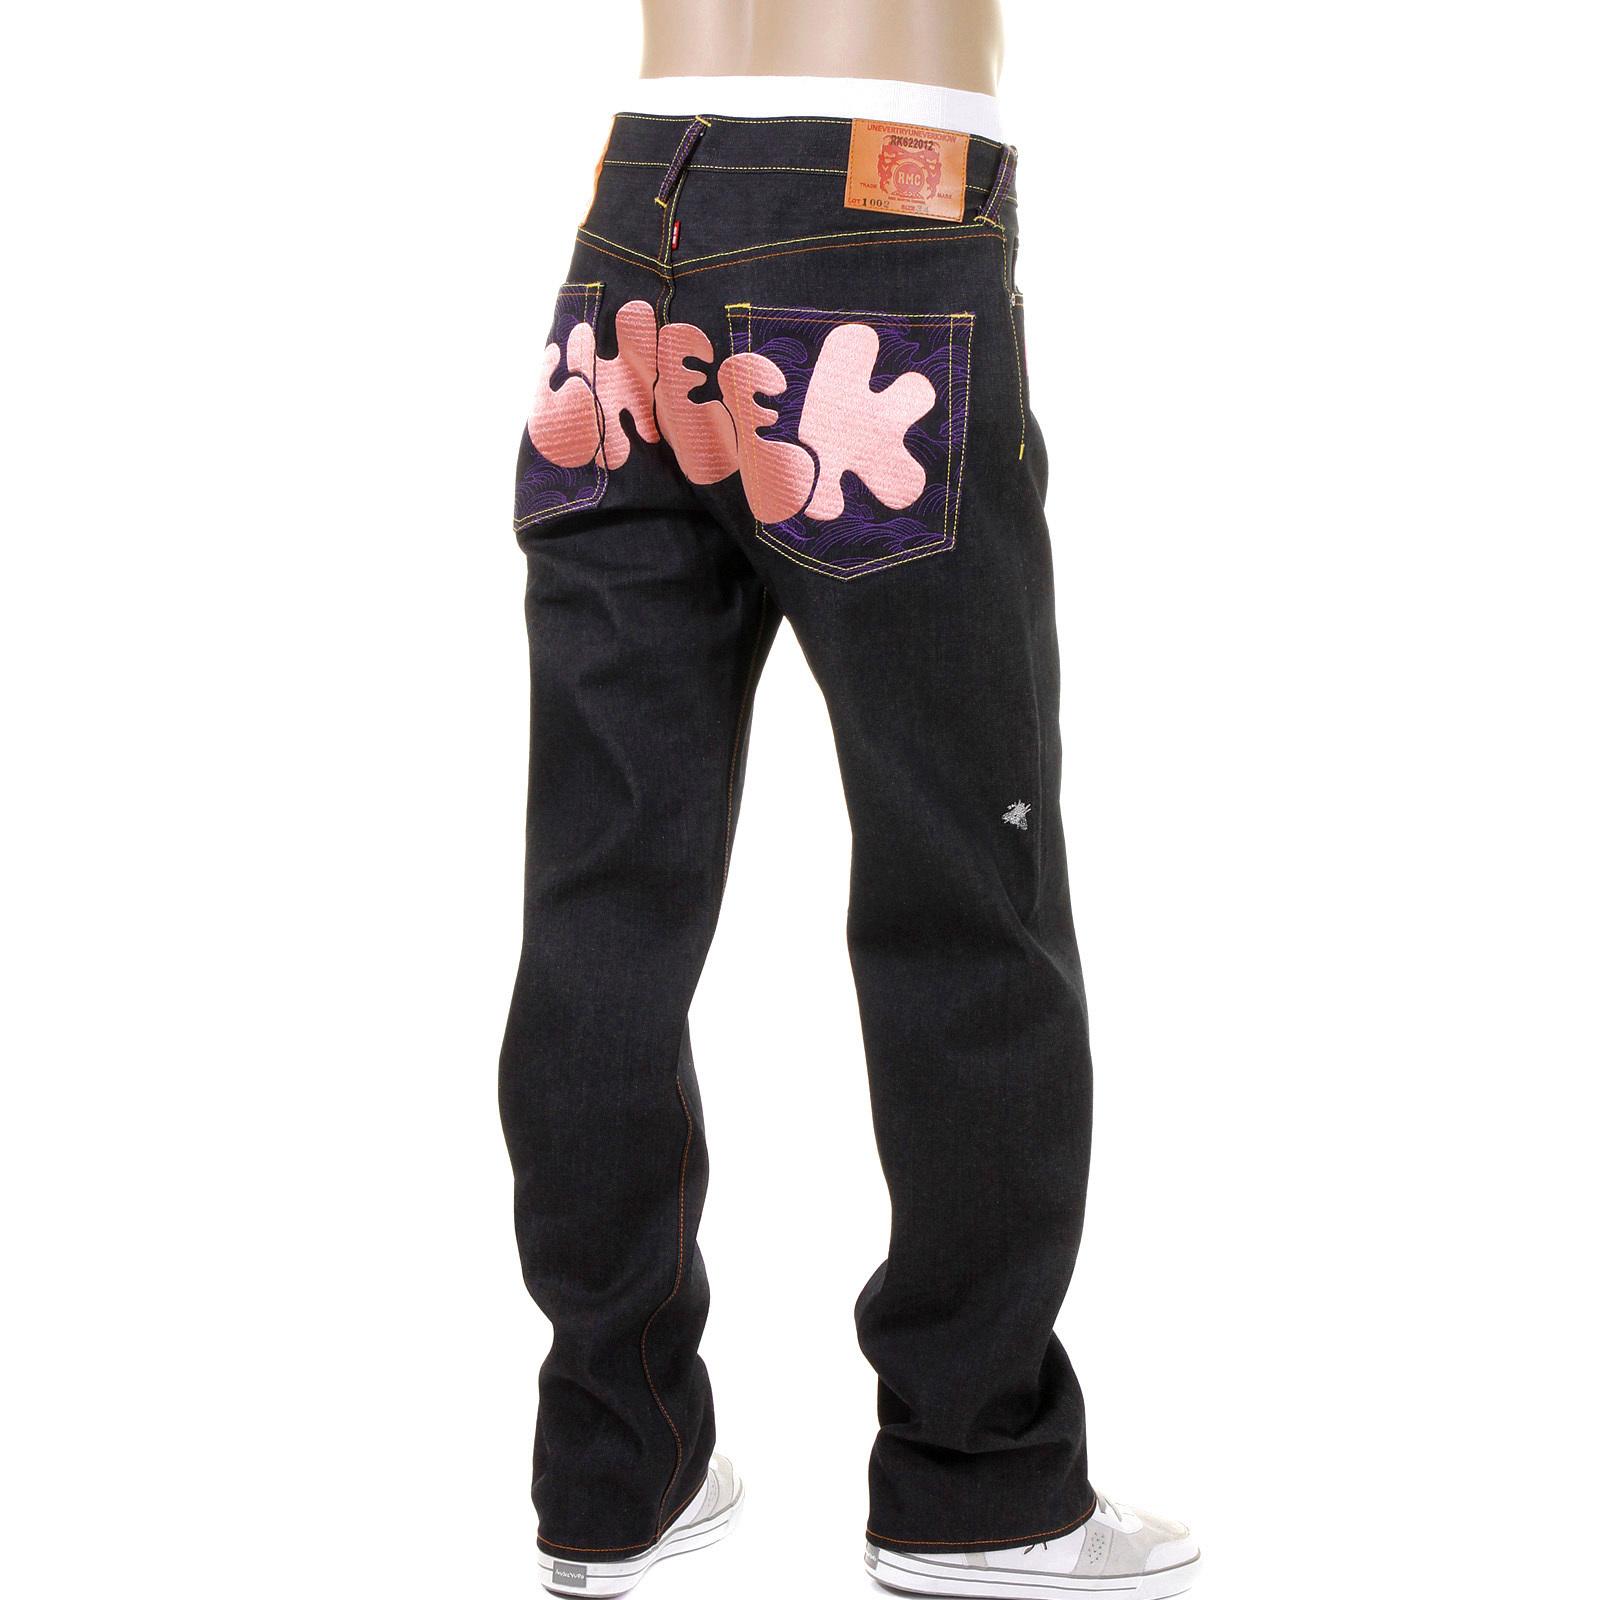 Rmc Jeans Dark Indigo Vintage Cut Raw Denim With Dizzee Rascal Tongue N Cheek Purple